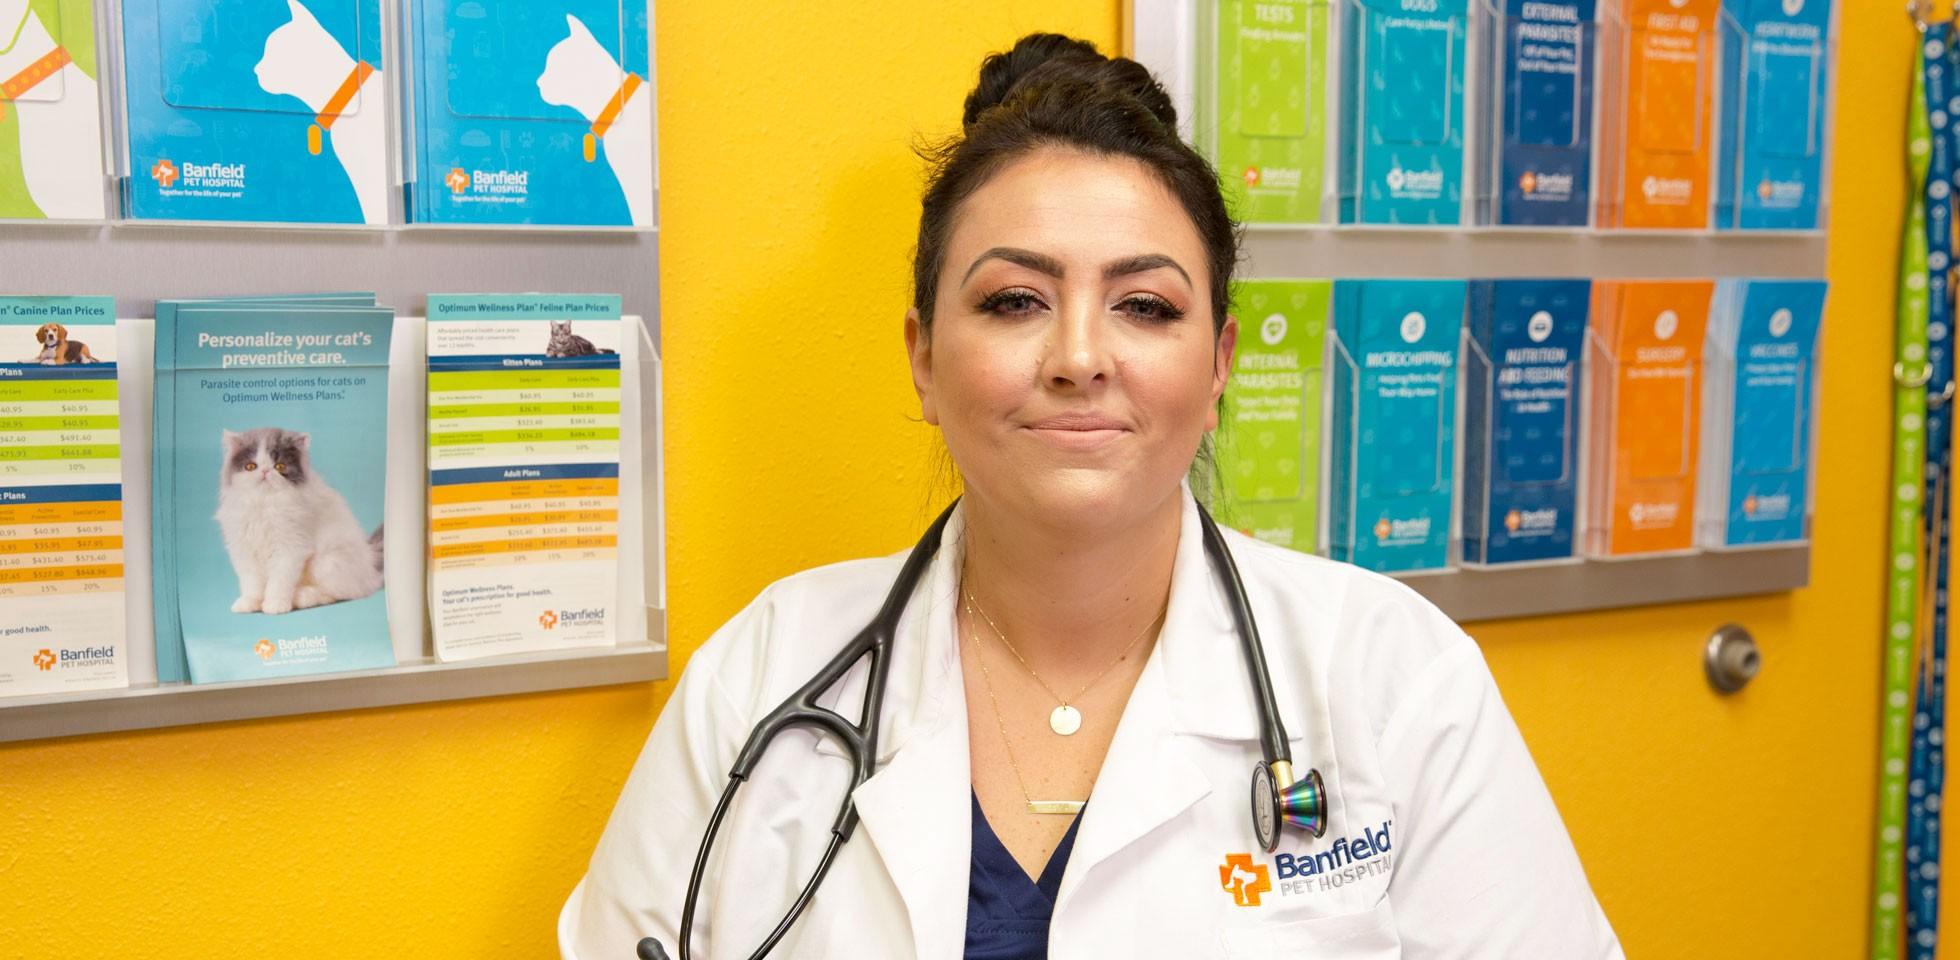 Emily Pashaian-Grant, Veterinarian - Banfield Pet Hospital Careers